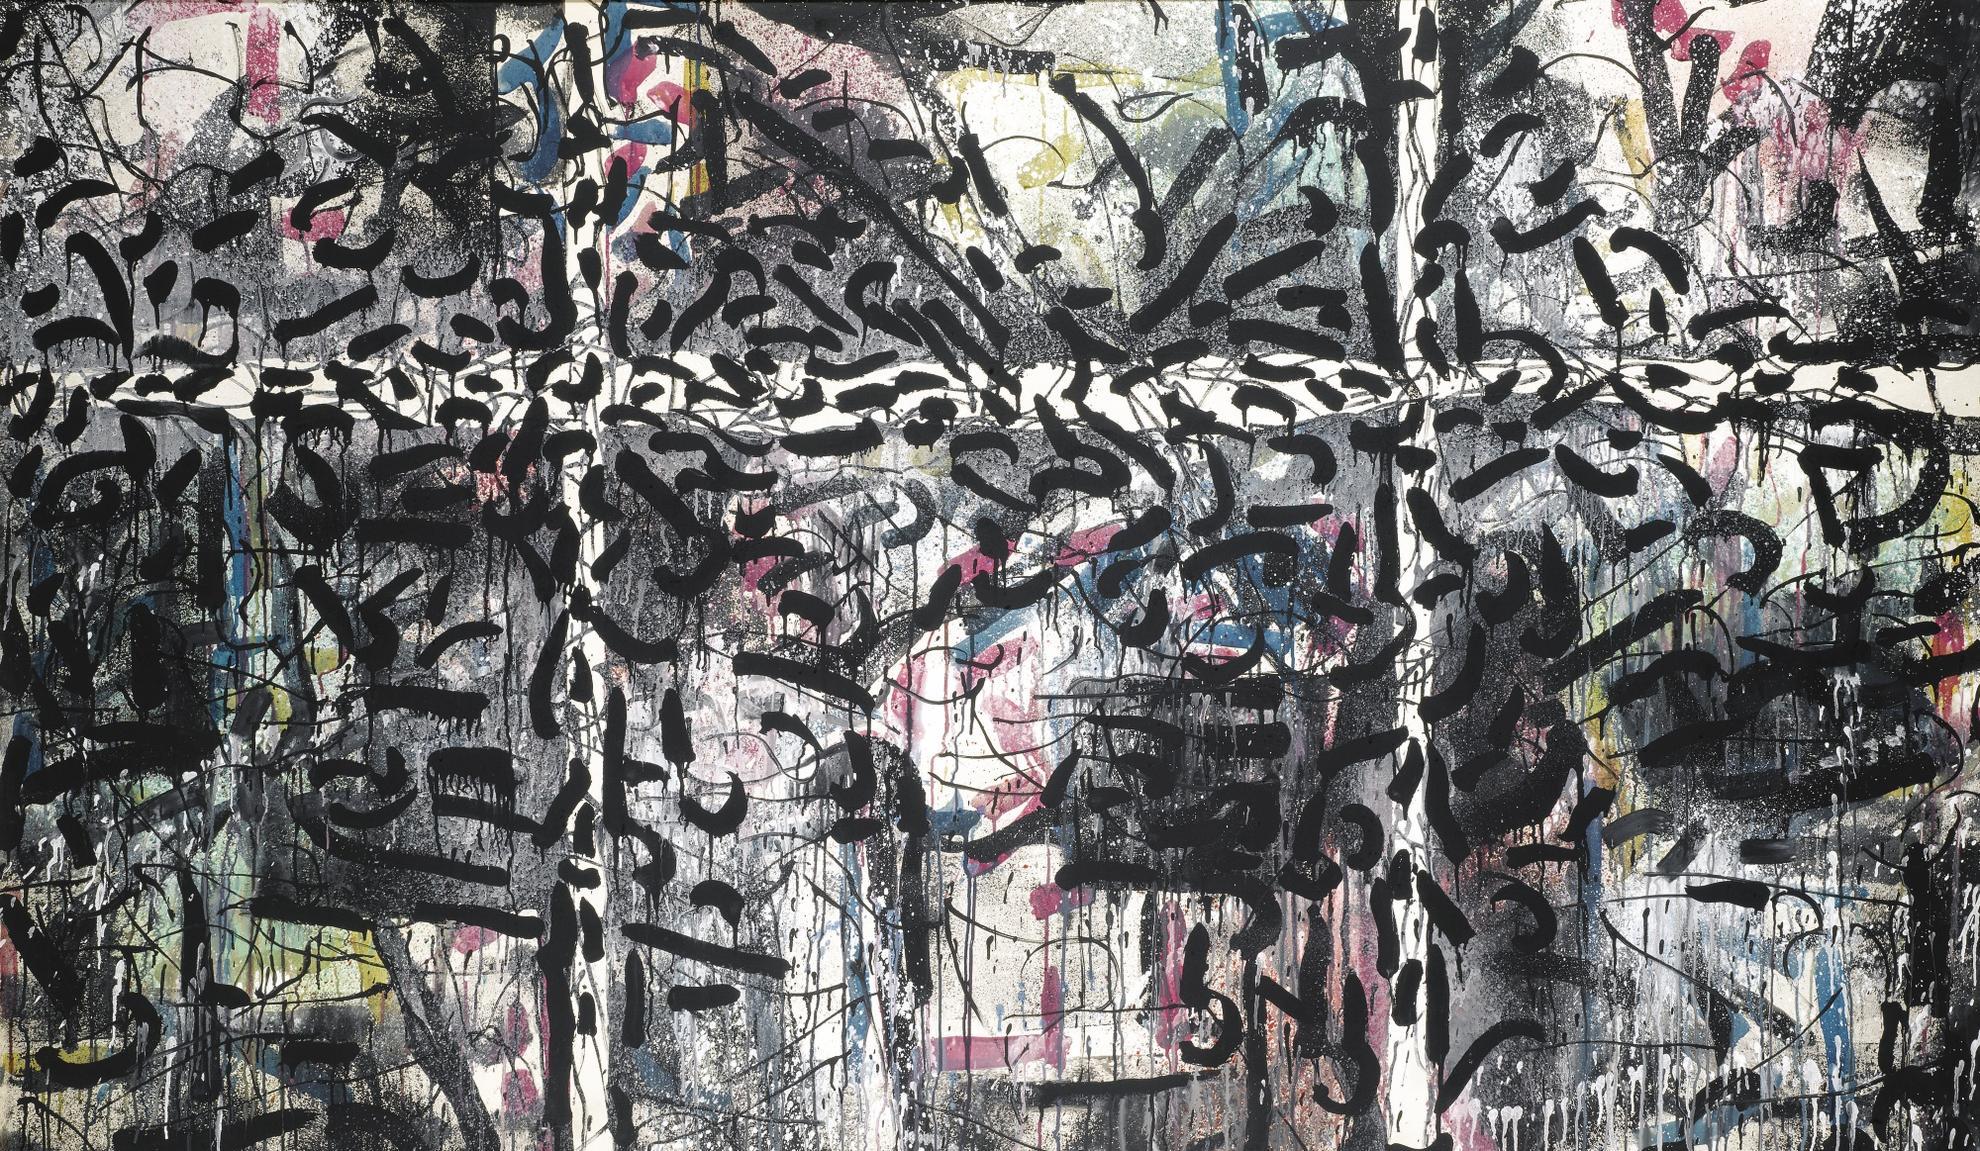 Jean-Paul Riopelle-Dark Background, White Squares With Black Streaks-1964